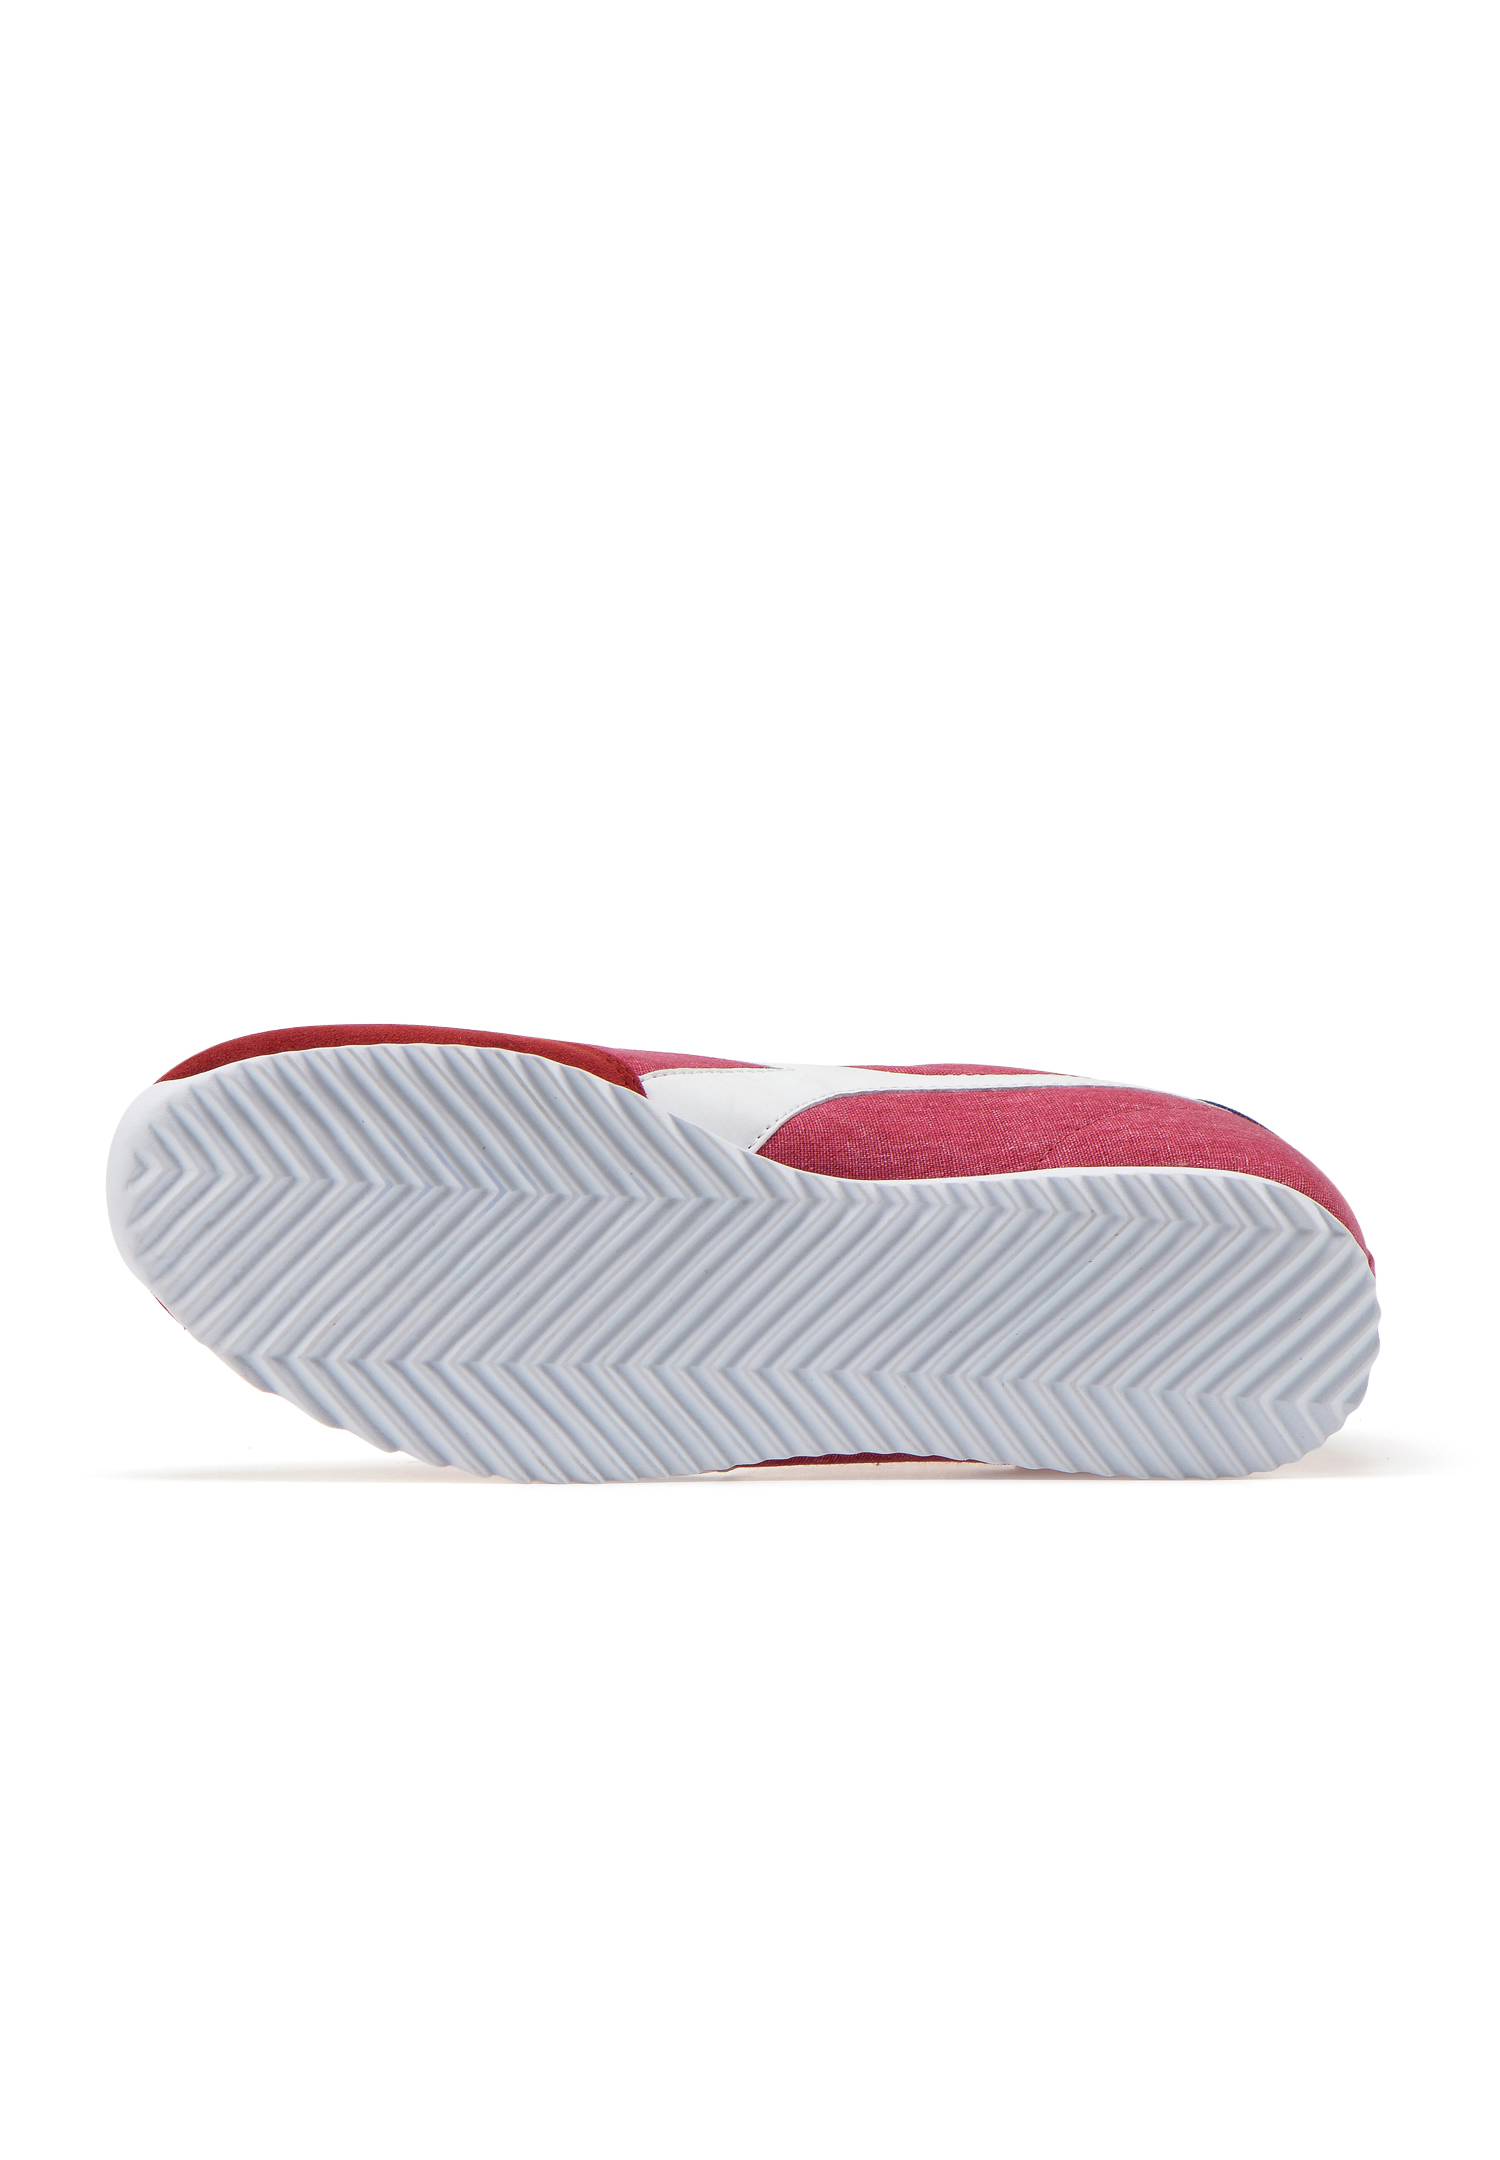 Scarpe-Diadora-Jog-Light-C-Sneakers-sportive-uomo-donna-vari-colori-e-taglie miniatura 10